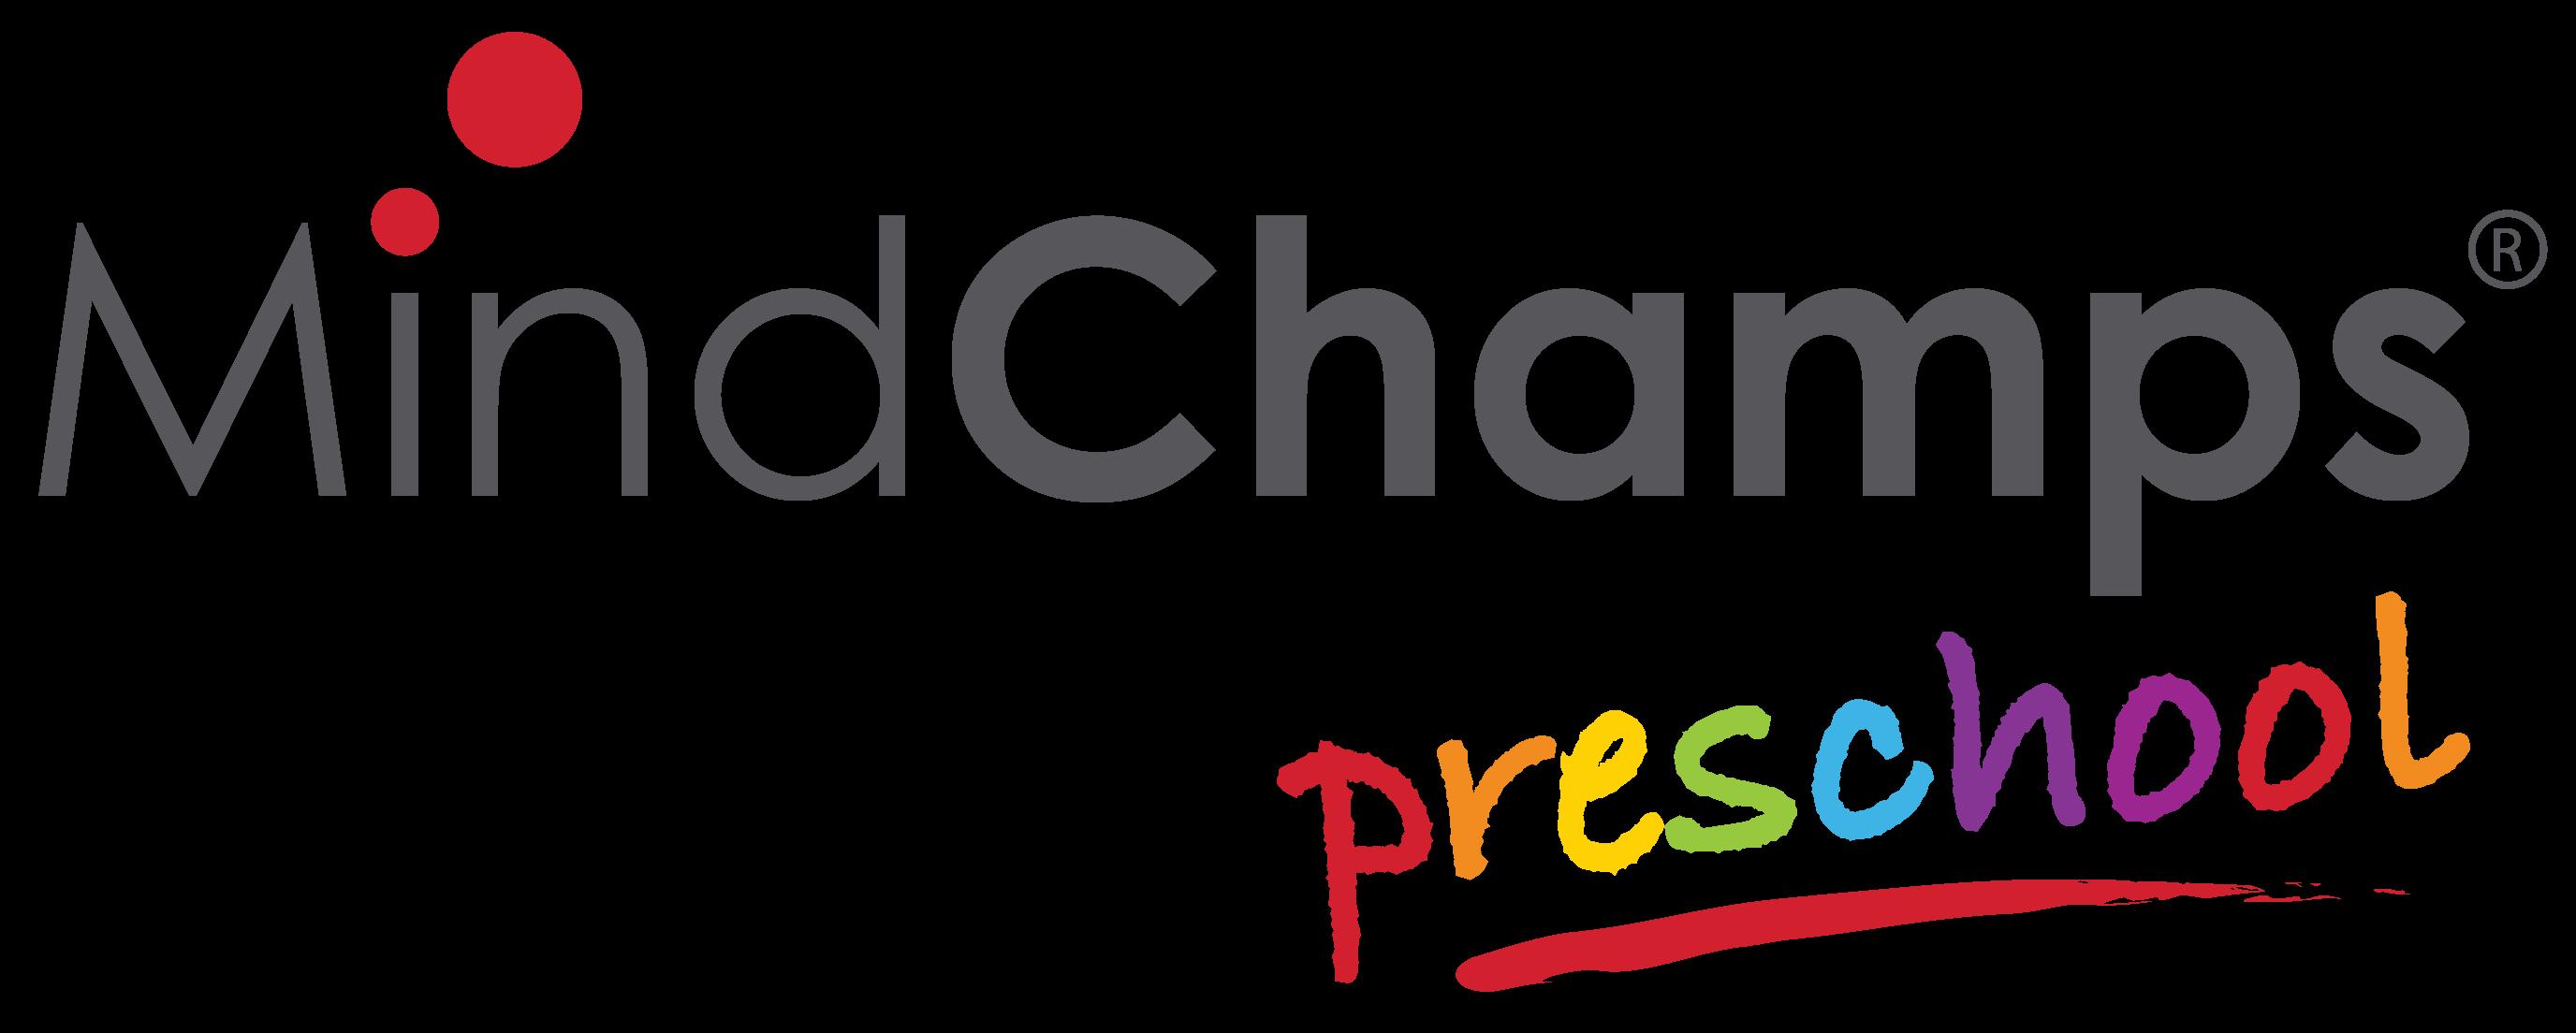 MindChamps PreSchool Logo